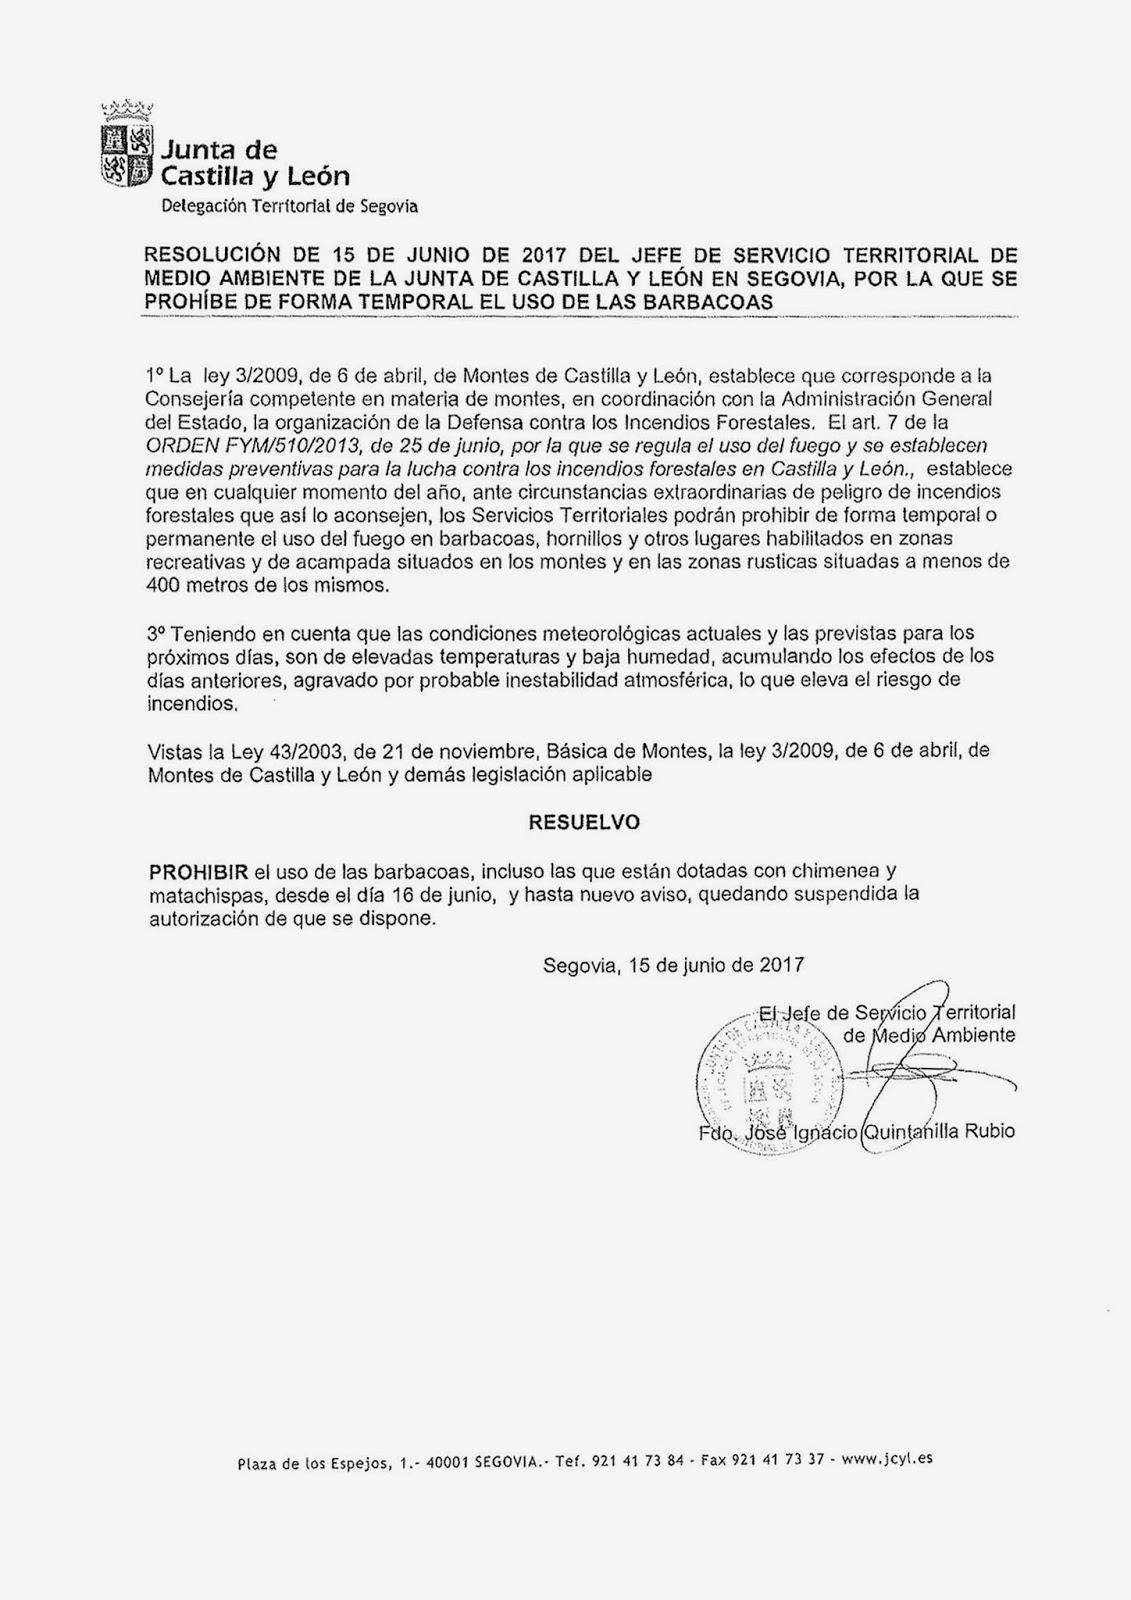 P gina web oficial del ayuntamiento de coca segovia - Matachispas para chimeneas ...